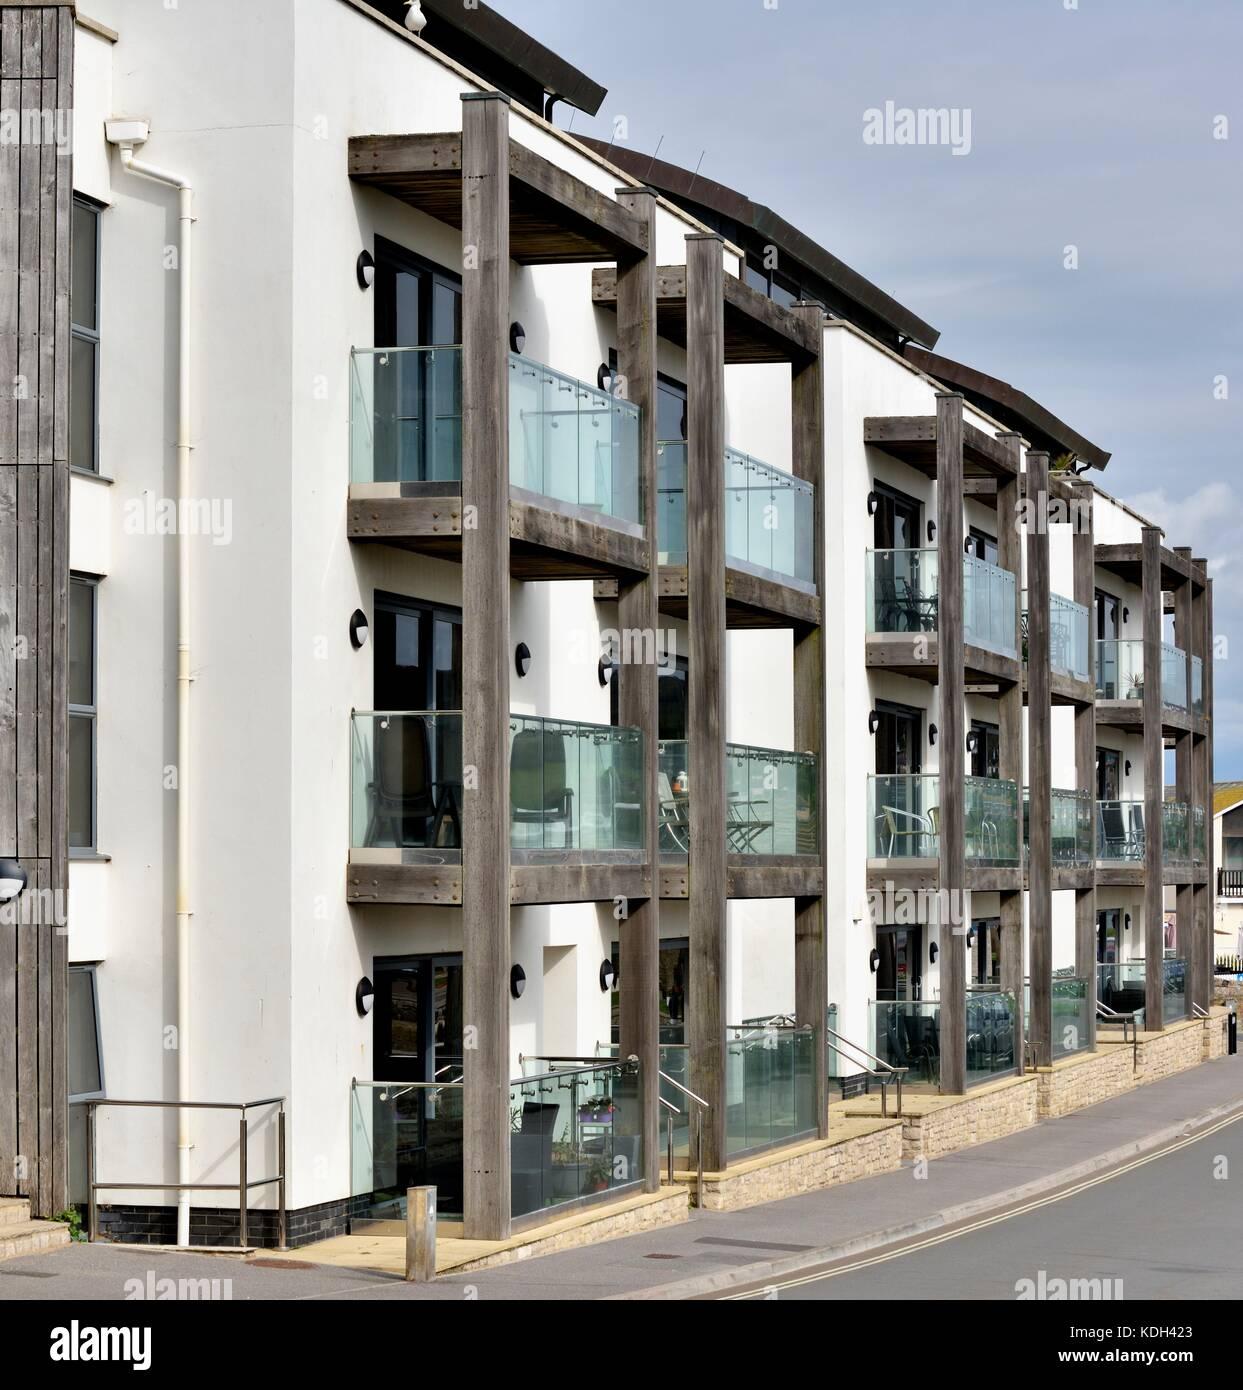 England Apartments: Luxury Apartments Uk Stock Photos & Luxury Apartments Uk